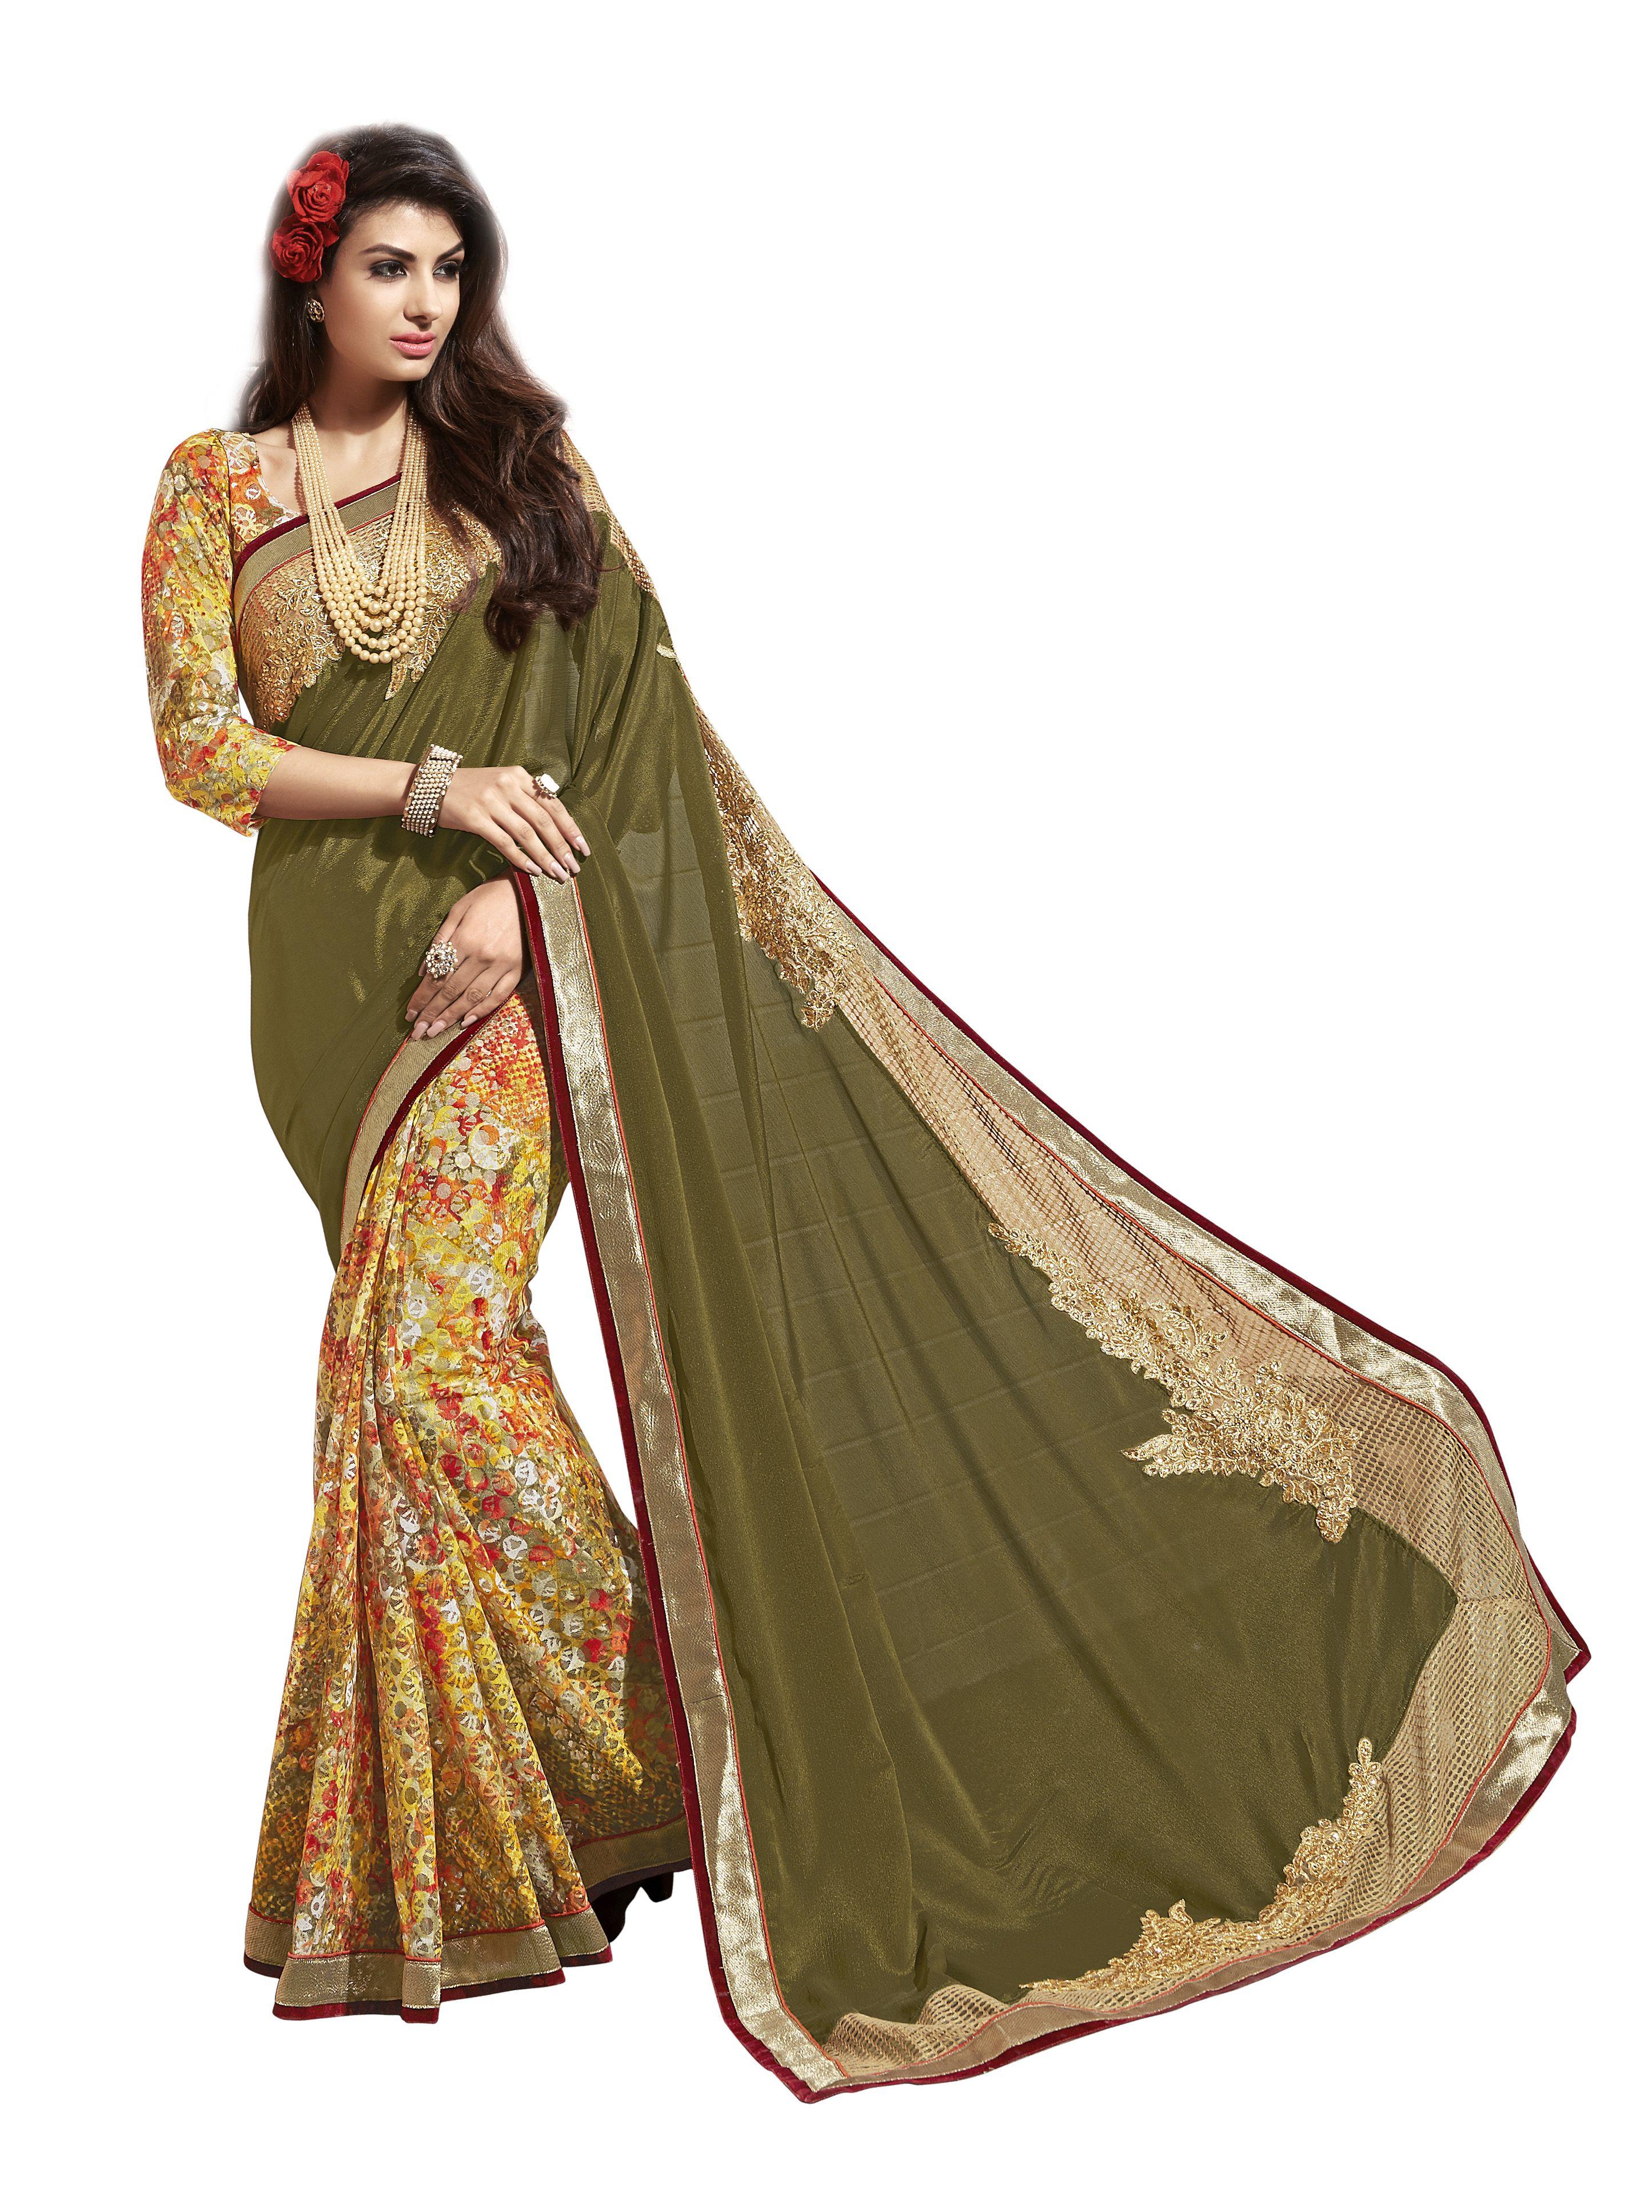 Saree blouse design new atsendshoppinglpfvptesgiteiu